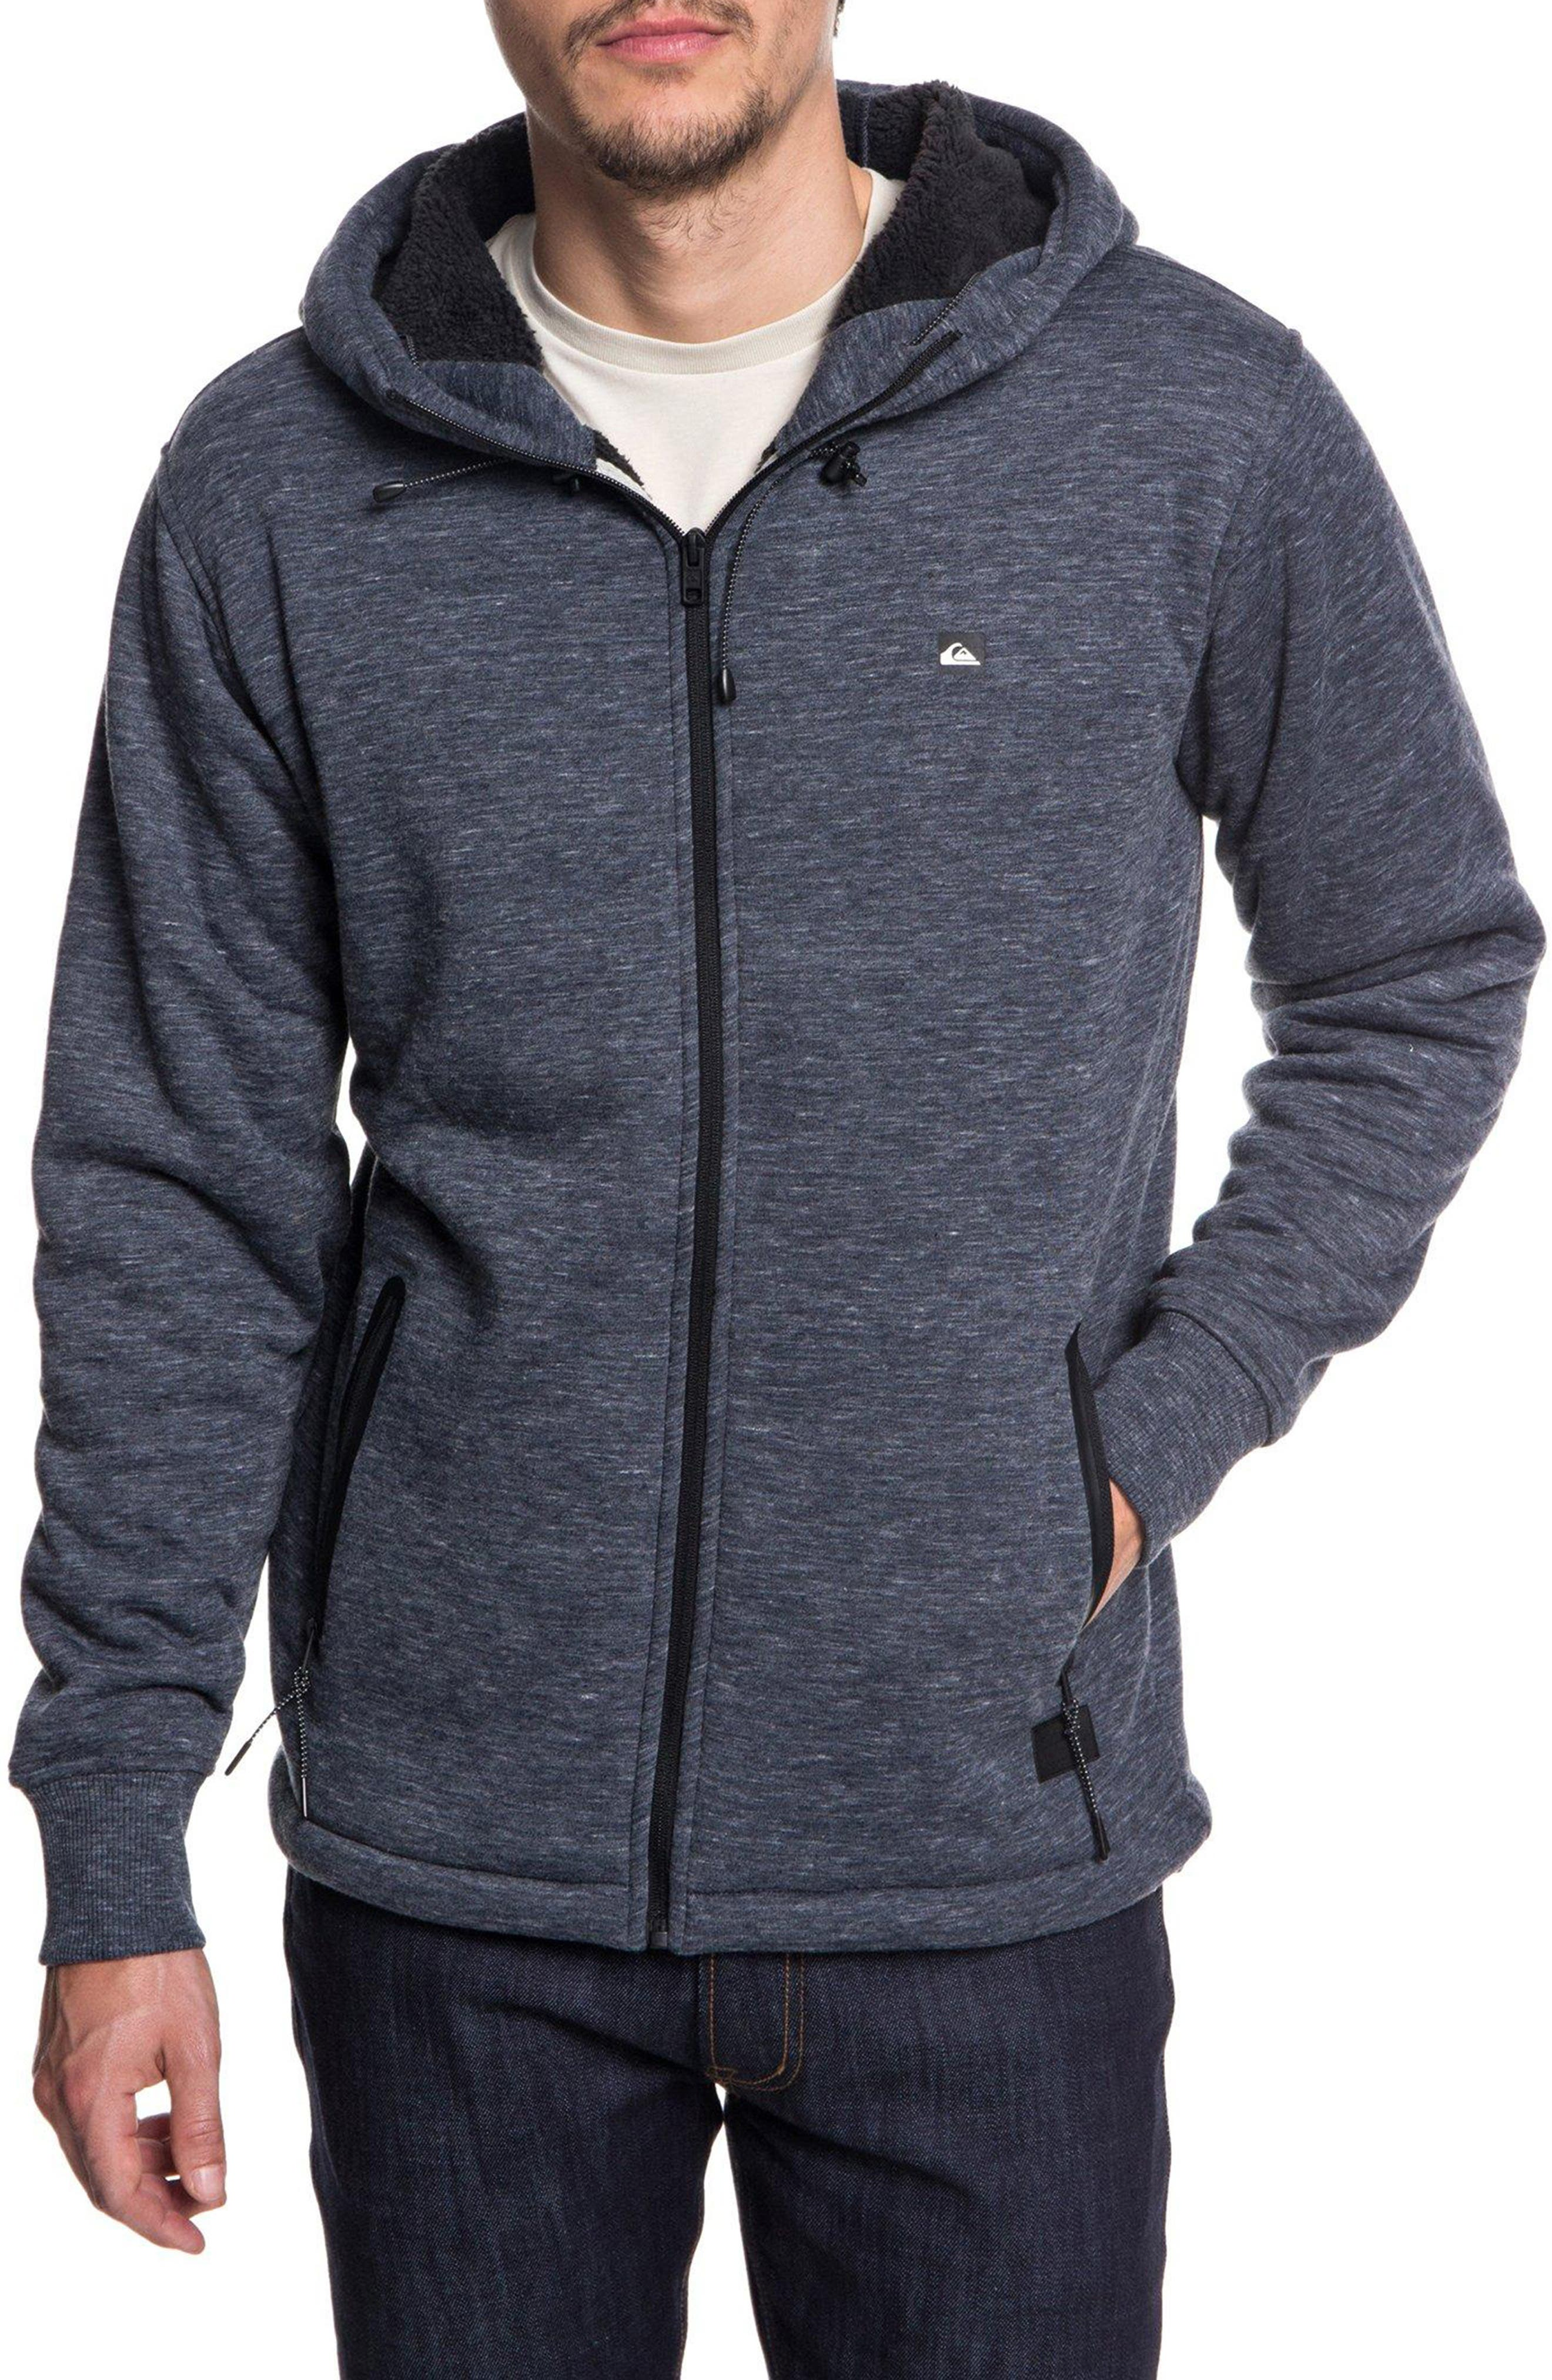 Kurow Fleece Hooded Jacket,                             Main thumbnail 1, color,                             BLUE NIGHTS HEATHER